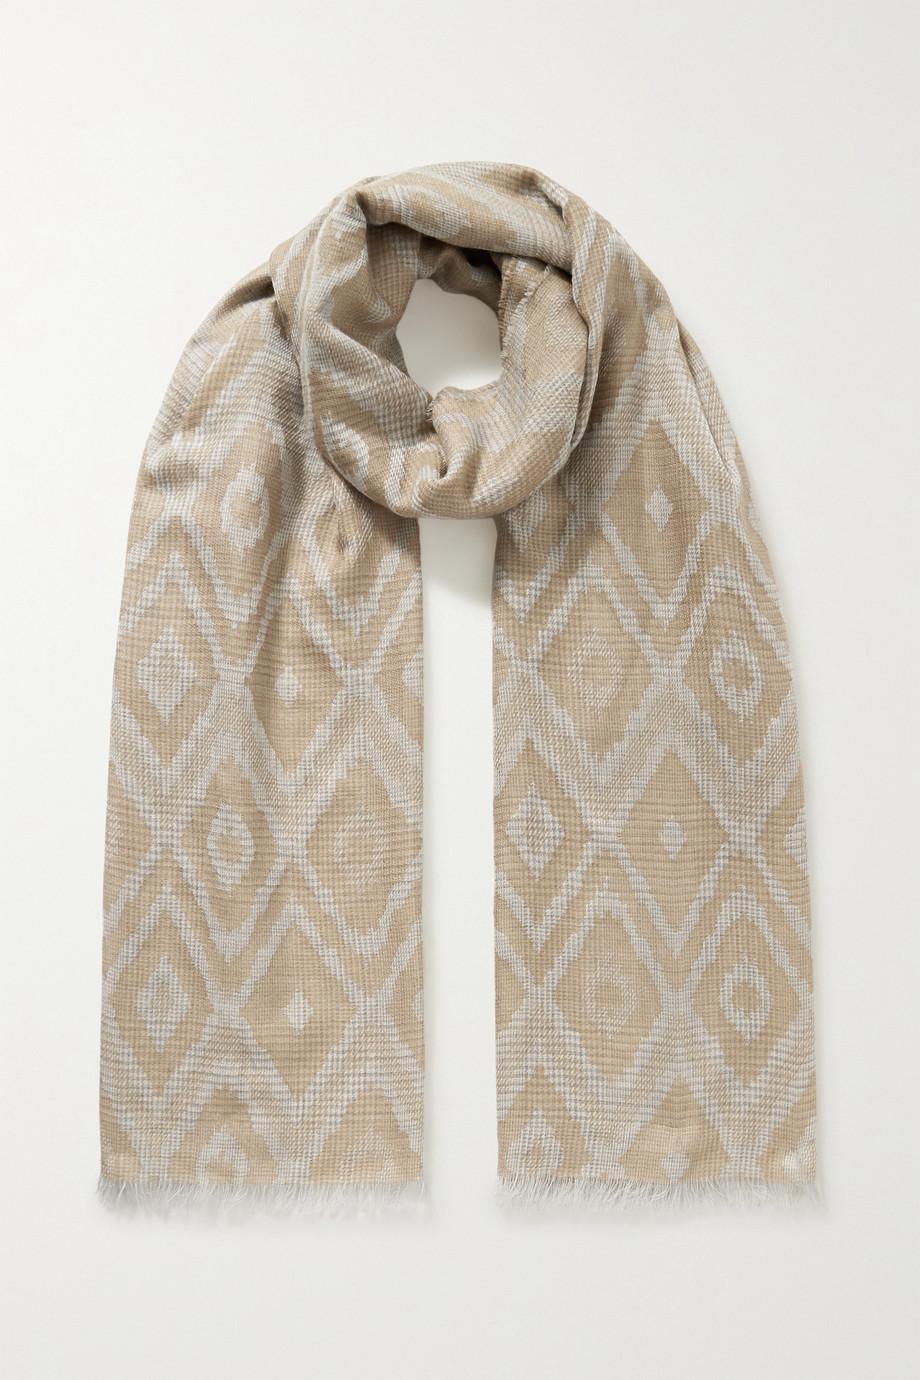 Johnstons of Elgin Frayed cashmere jacquard scarf